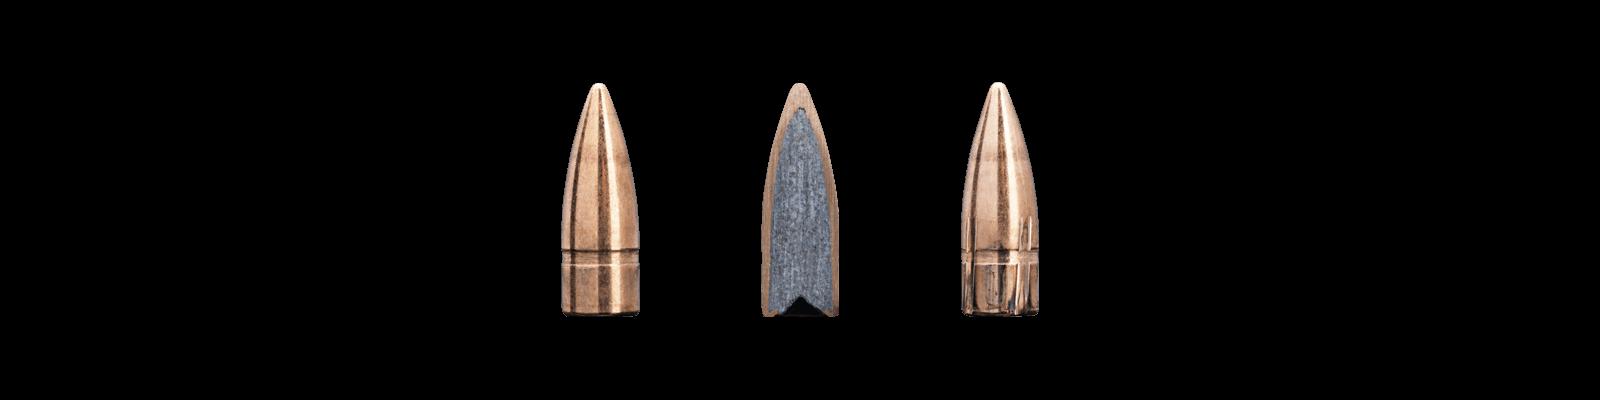 Sako 223 Rem Range 3,2g Speedhead, (105G) 100 kpl / ras